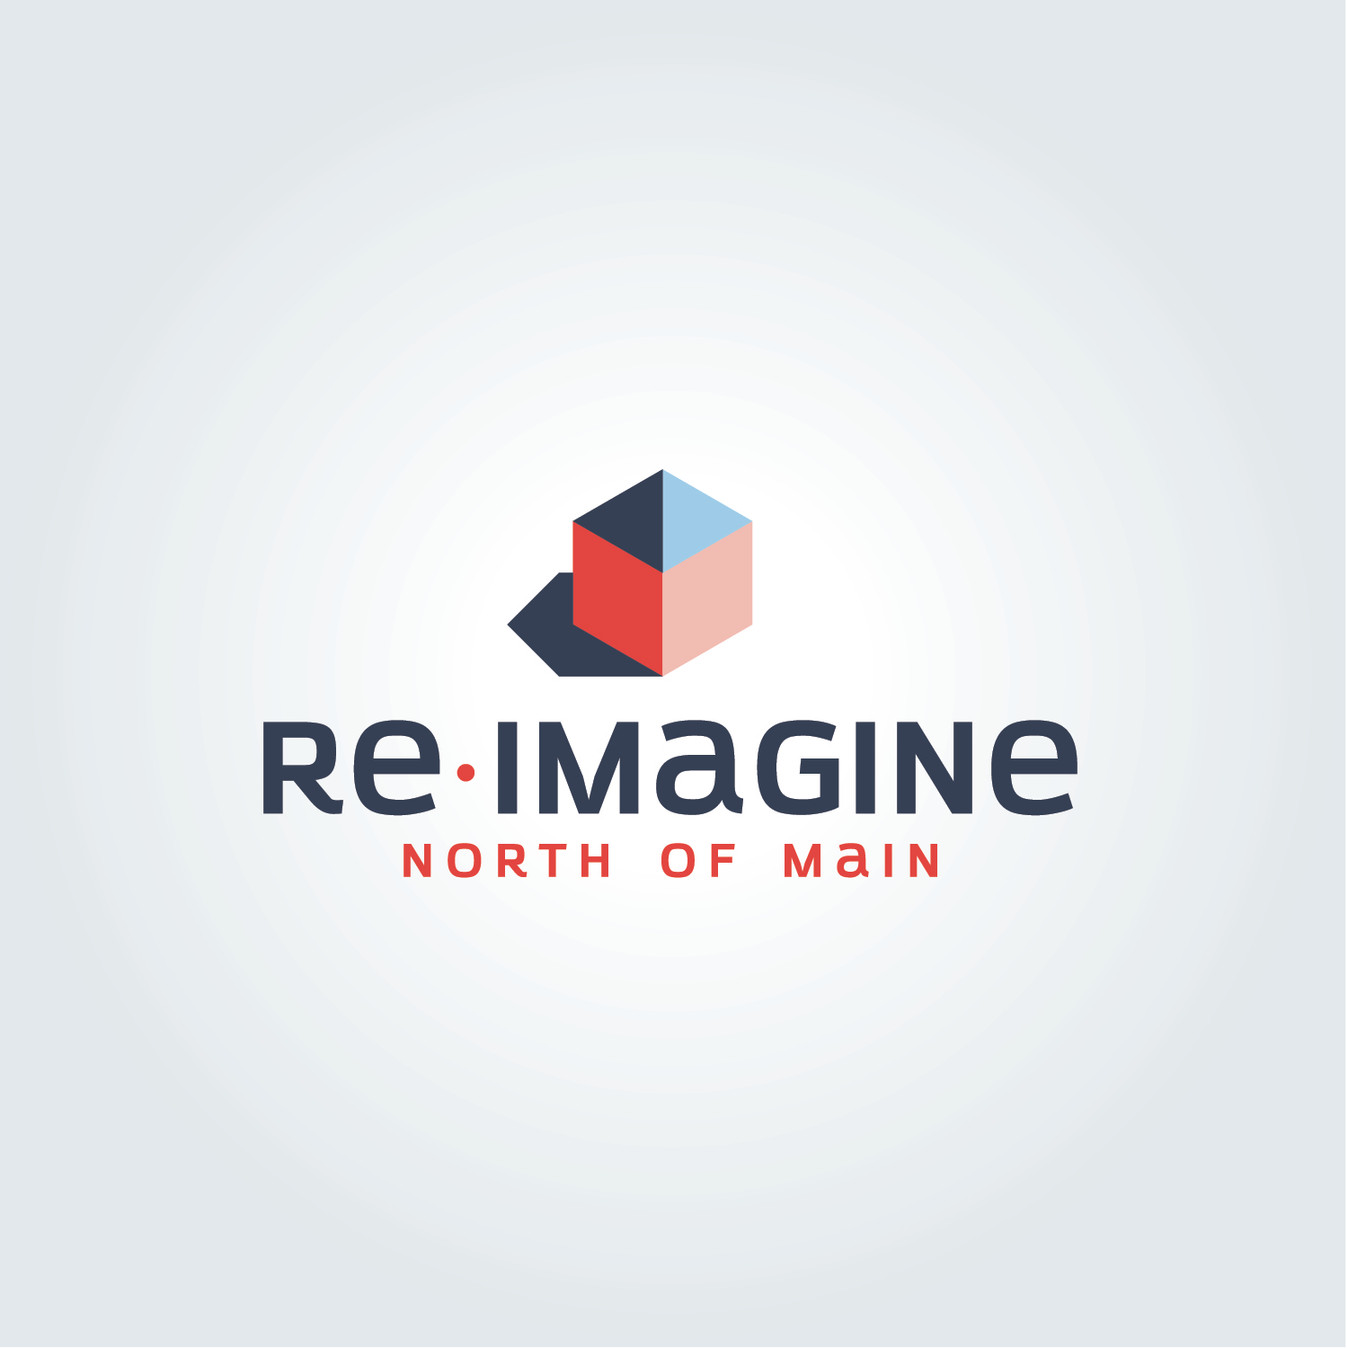 reimagine_option_1-01.jpg